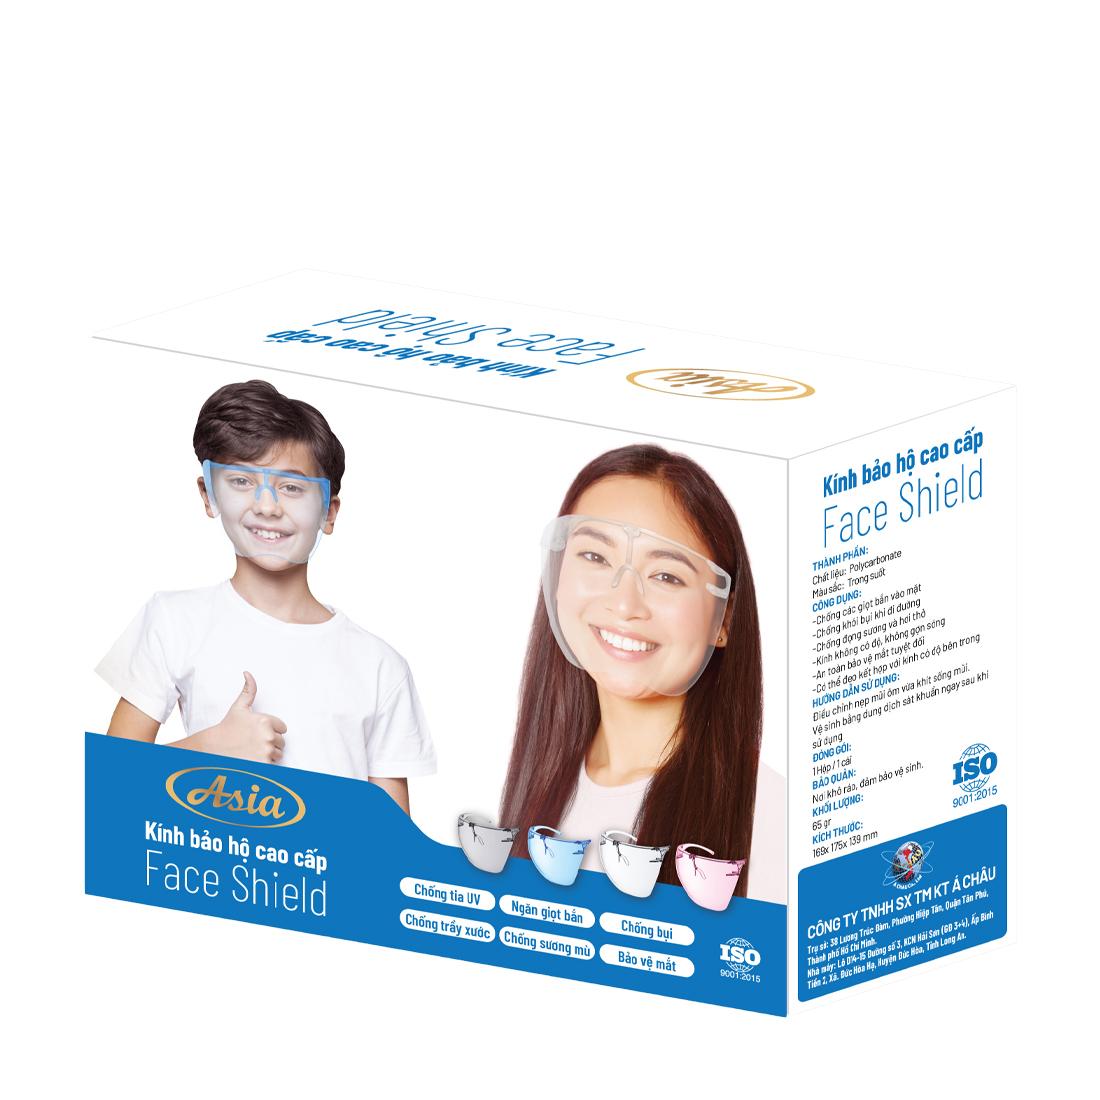 Kính bảo hộ cao cấp Asia Face Shield hộp 1 cái